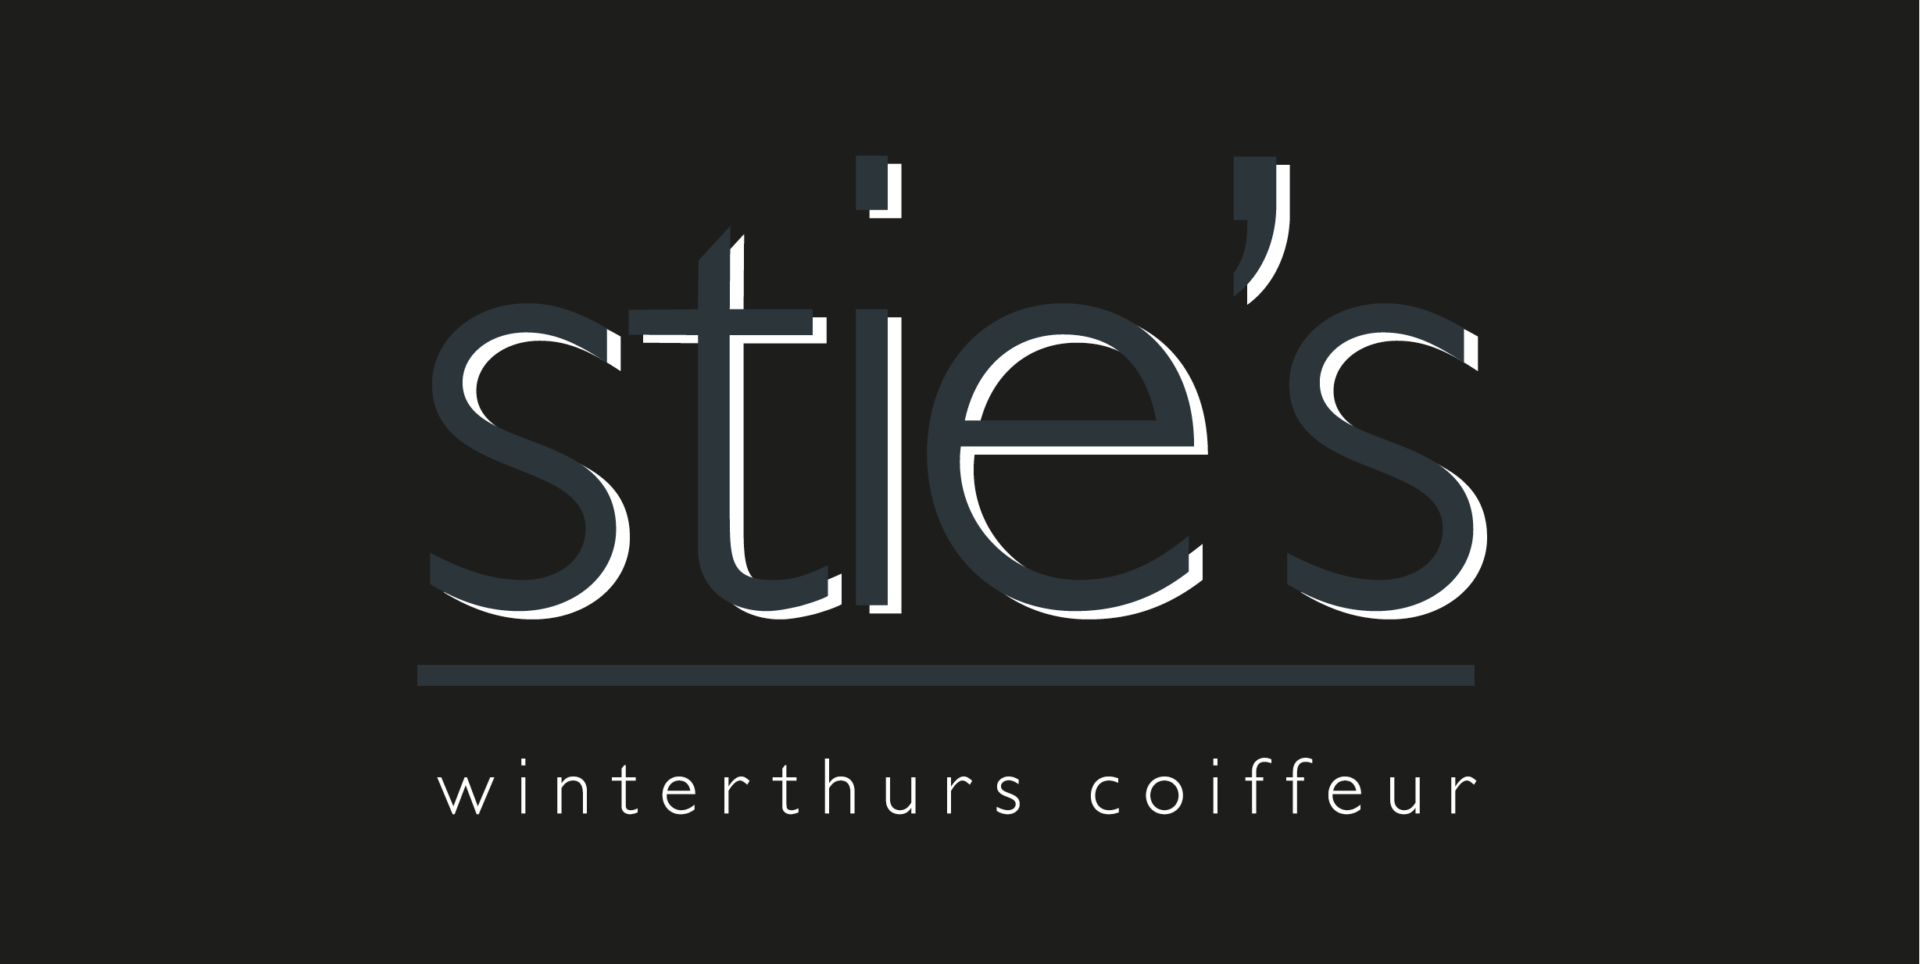 sties, winterthurs coiffeur